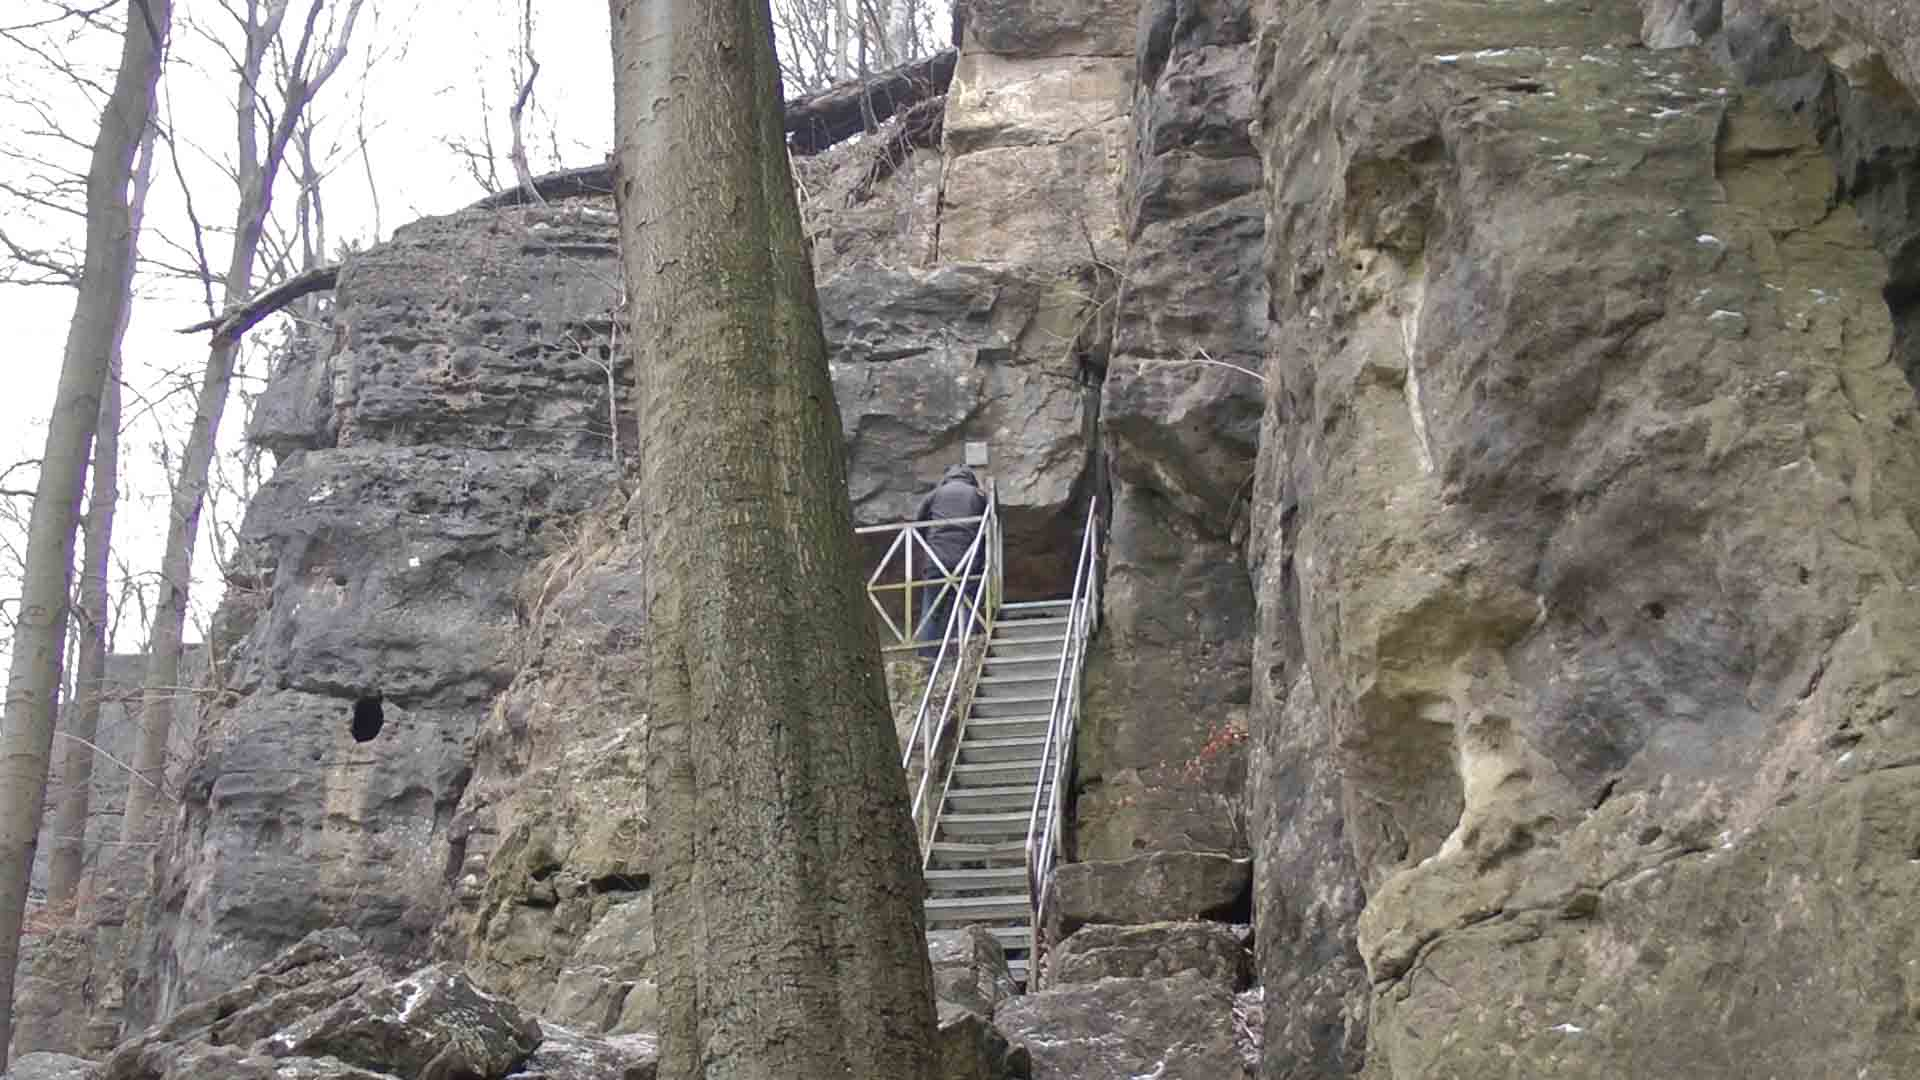 Lippoldshöhle